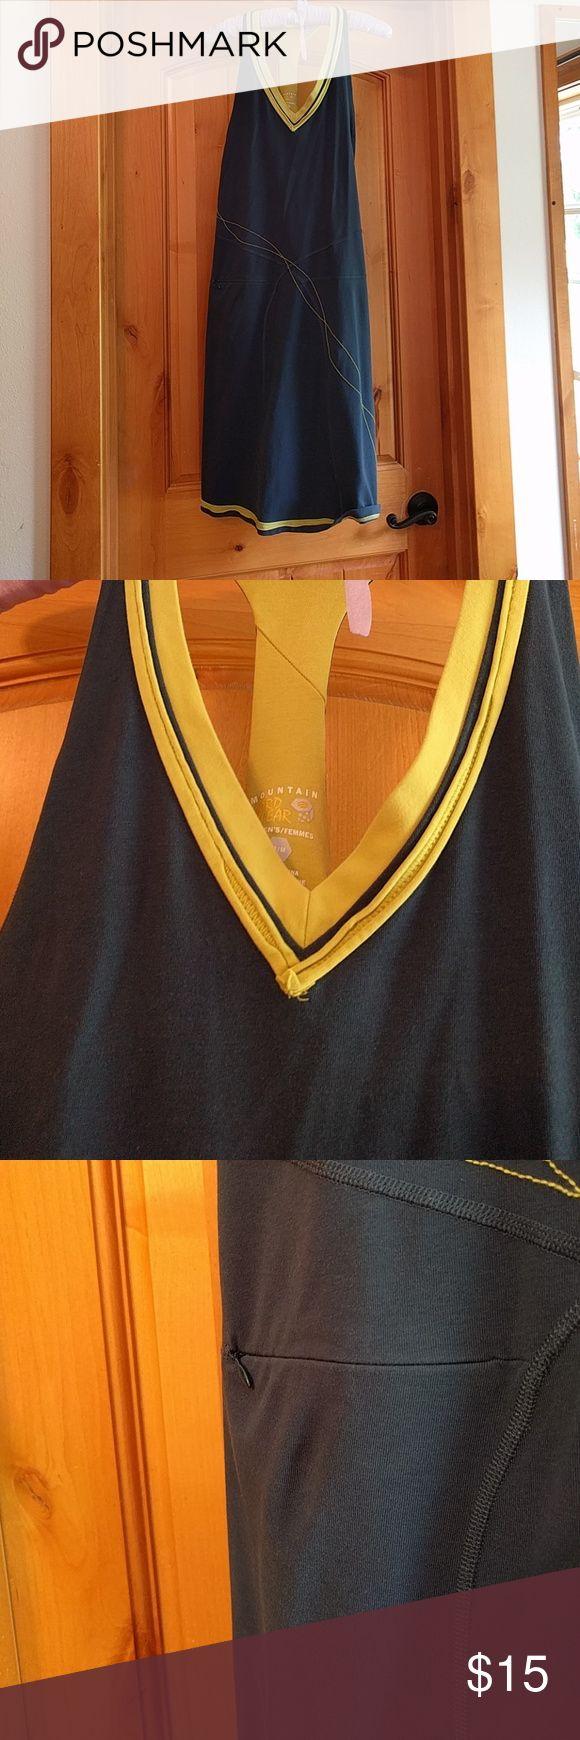 Mountain Hardware sport dress, reposhed! Mountain Hardware sport dress, secret zipper pocket (see photo) Mountain Hard Wear Dresses